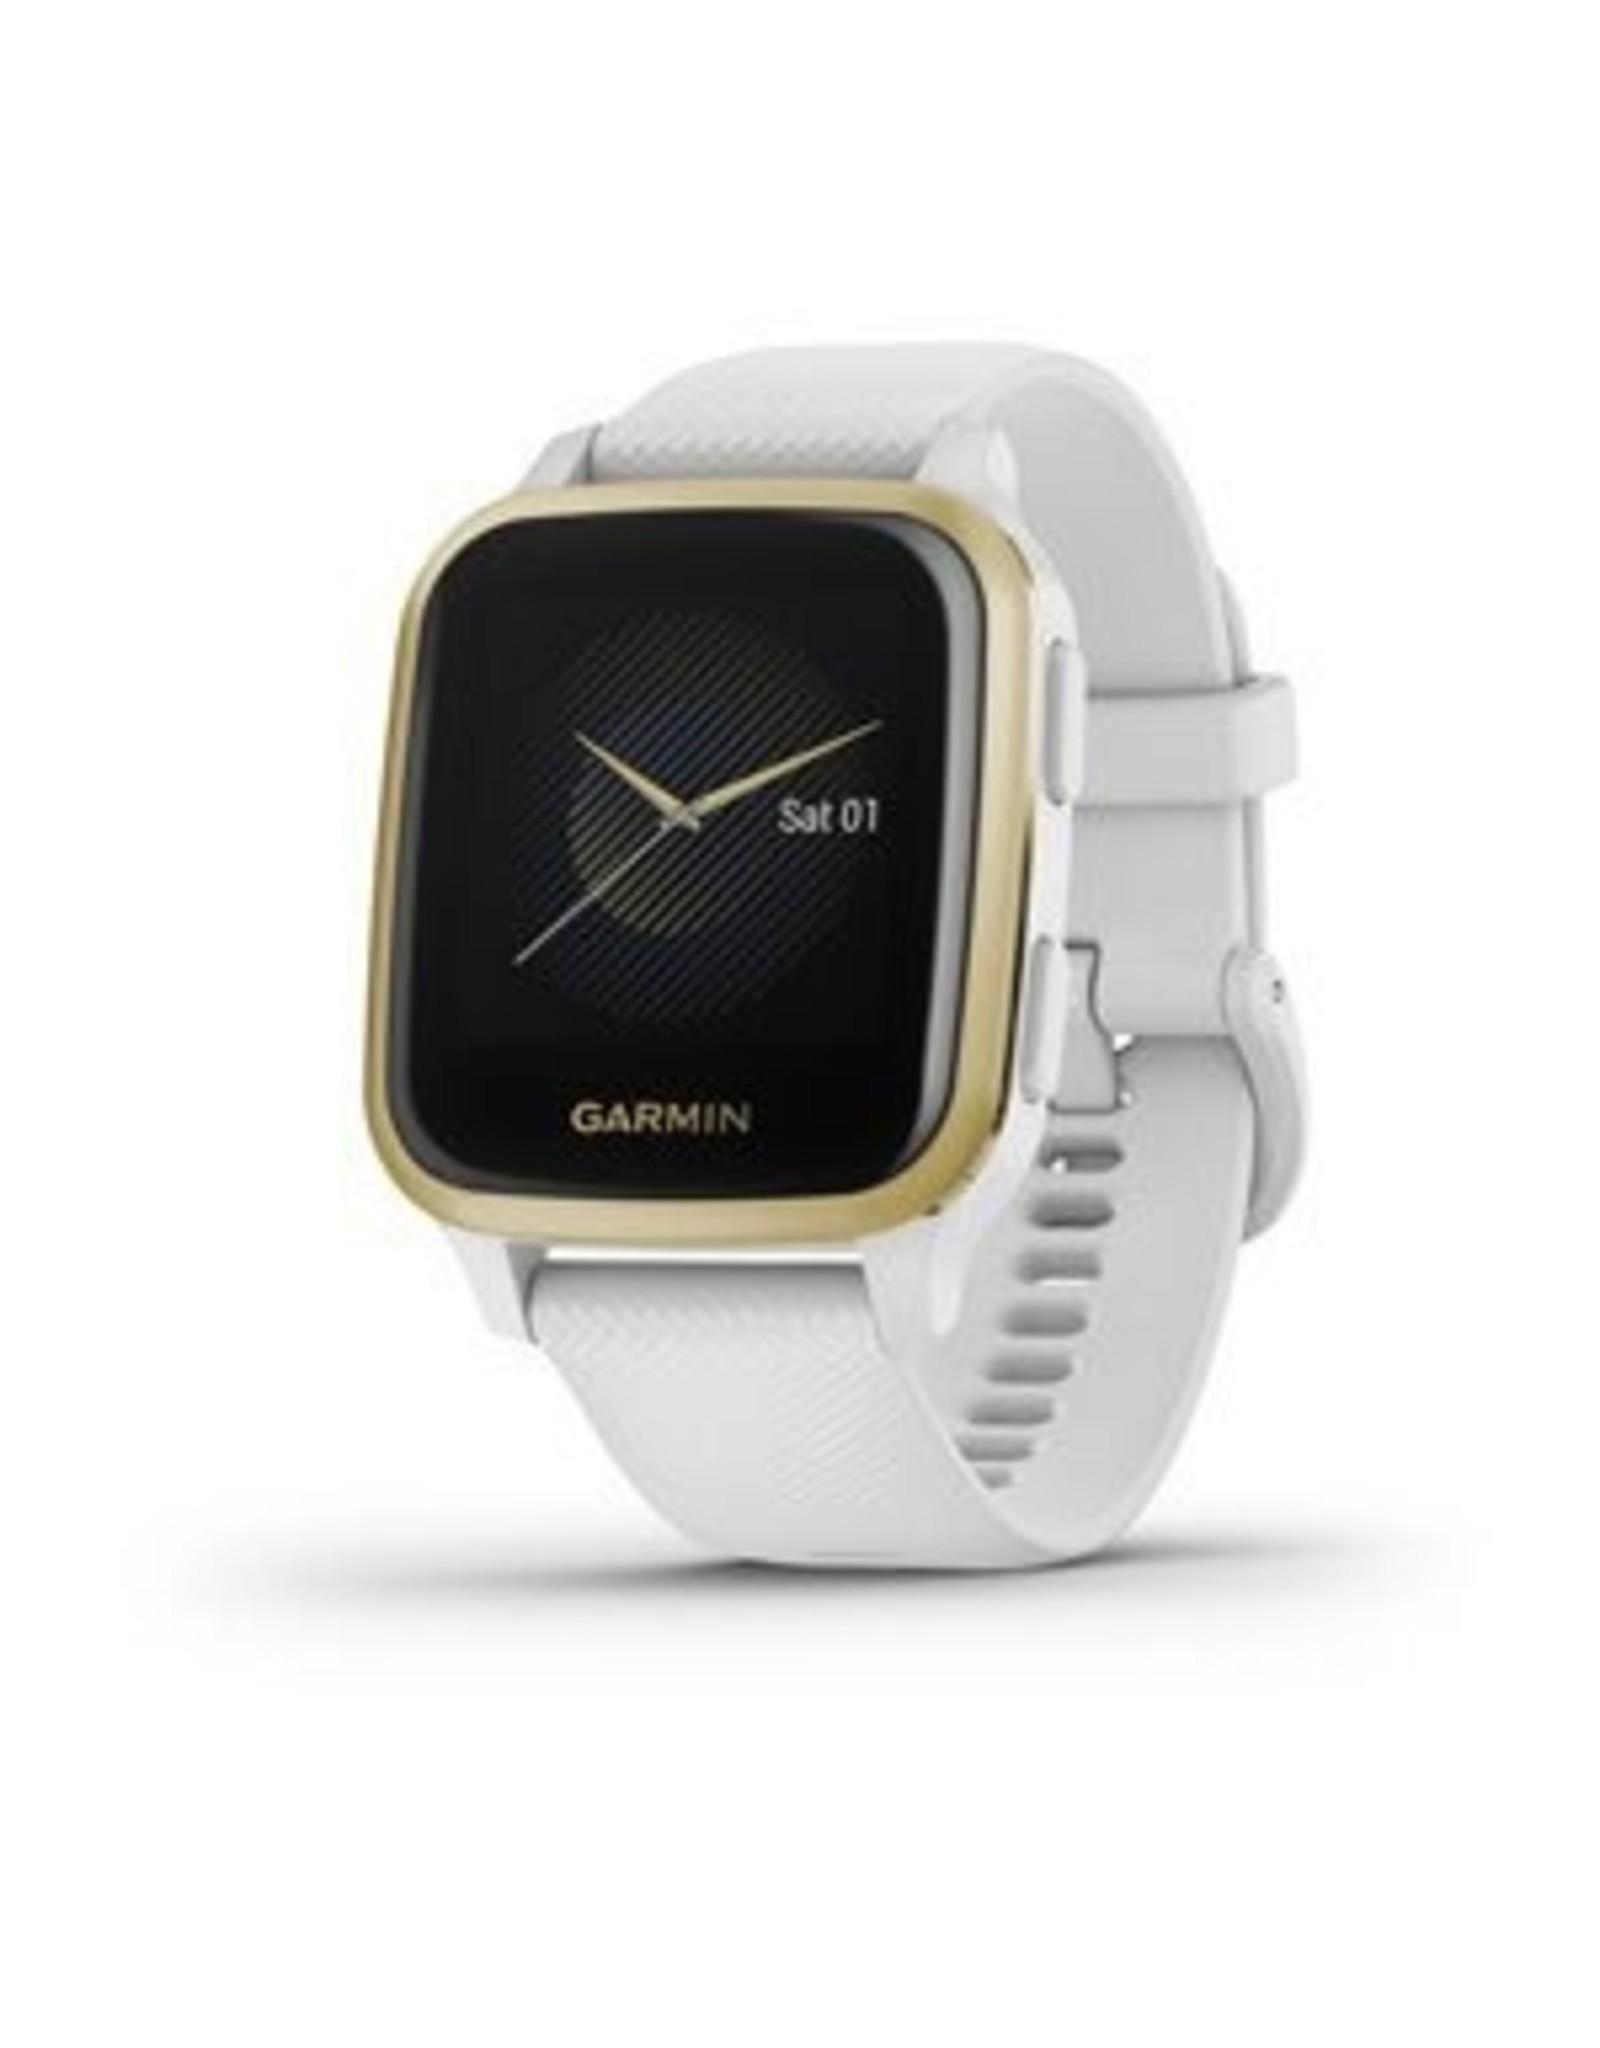 Garmin GARMIN VENU SQ WHITE/GOLD